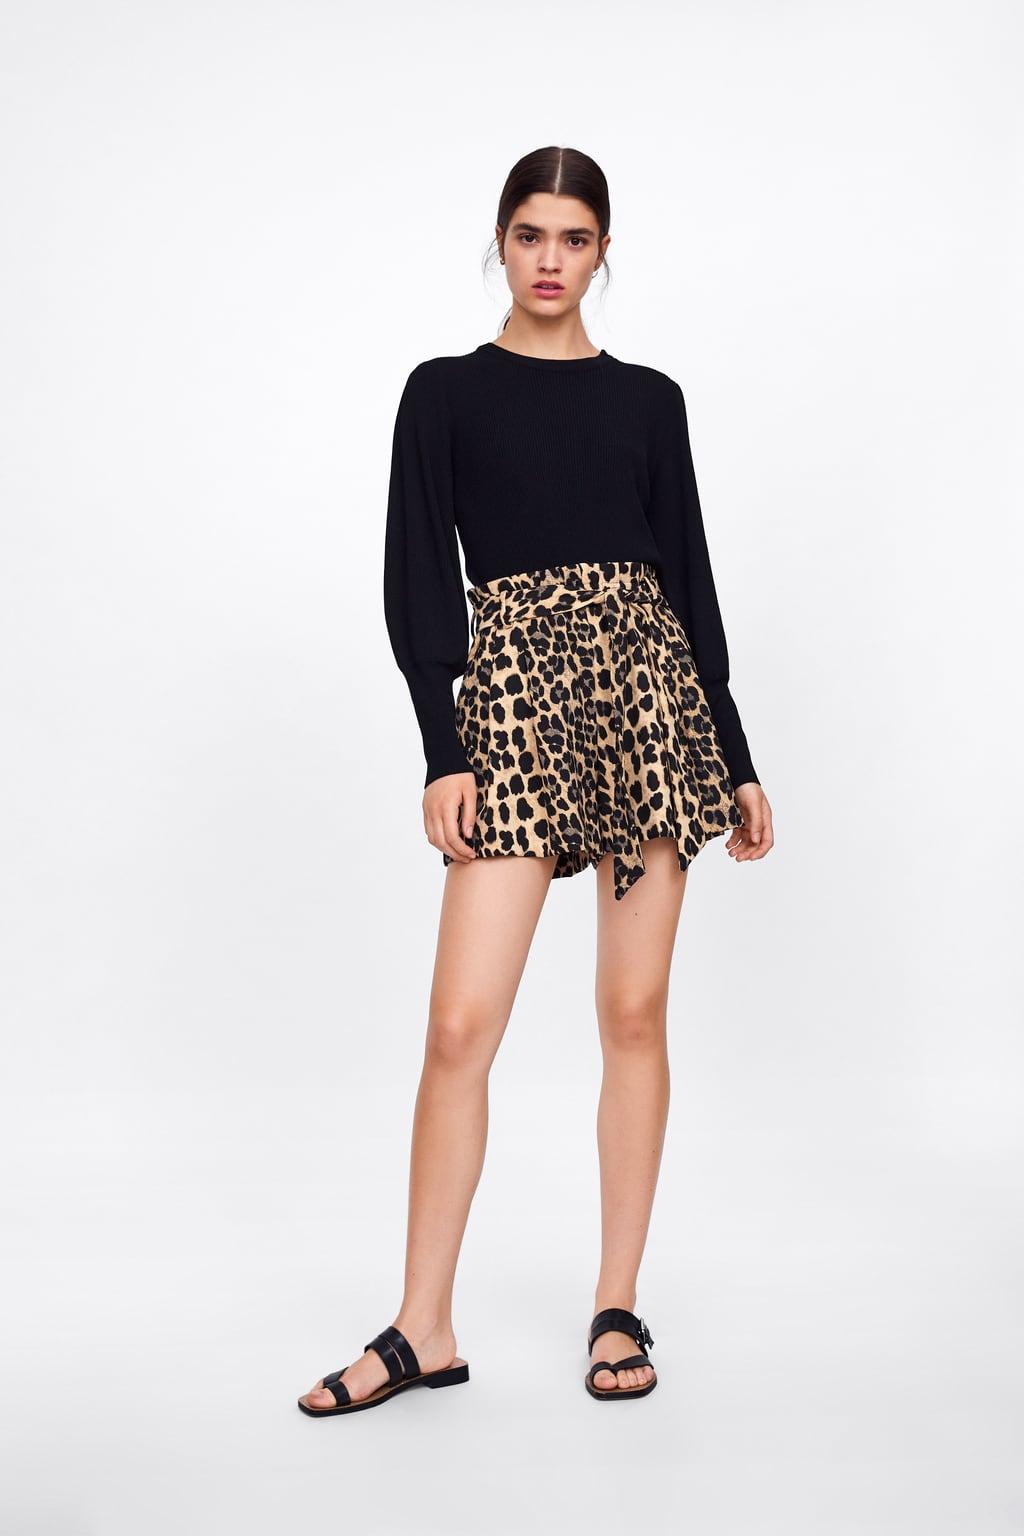 Zara Leopard Print Shorts.jpg